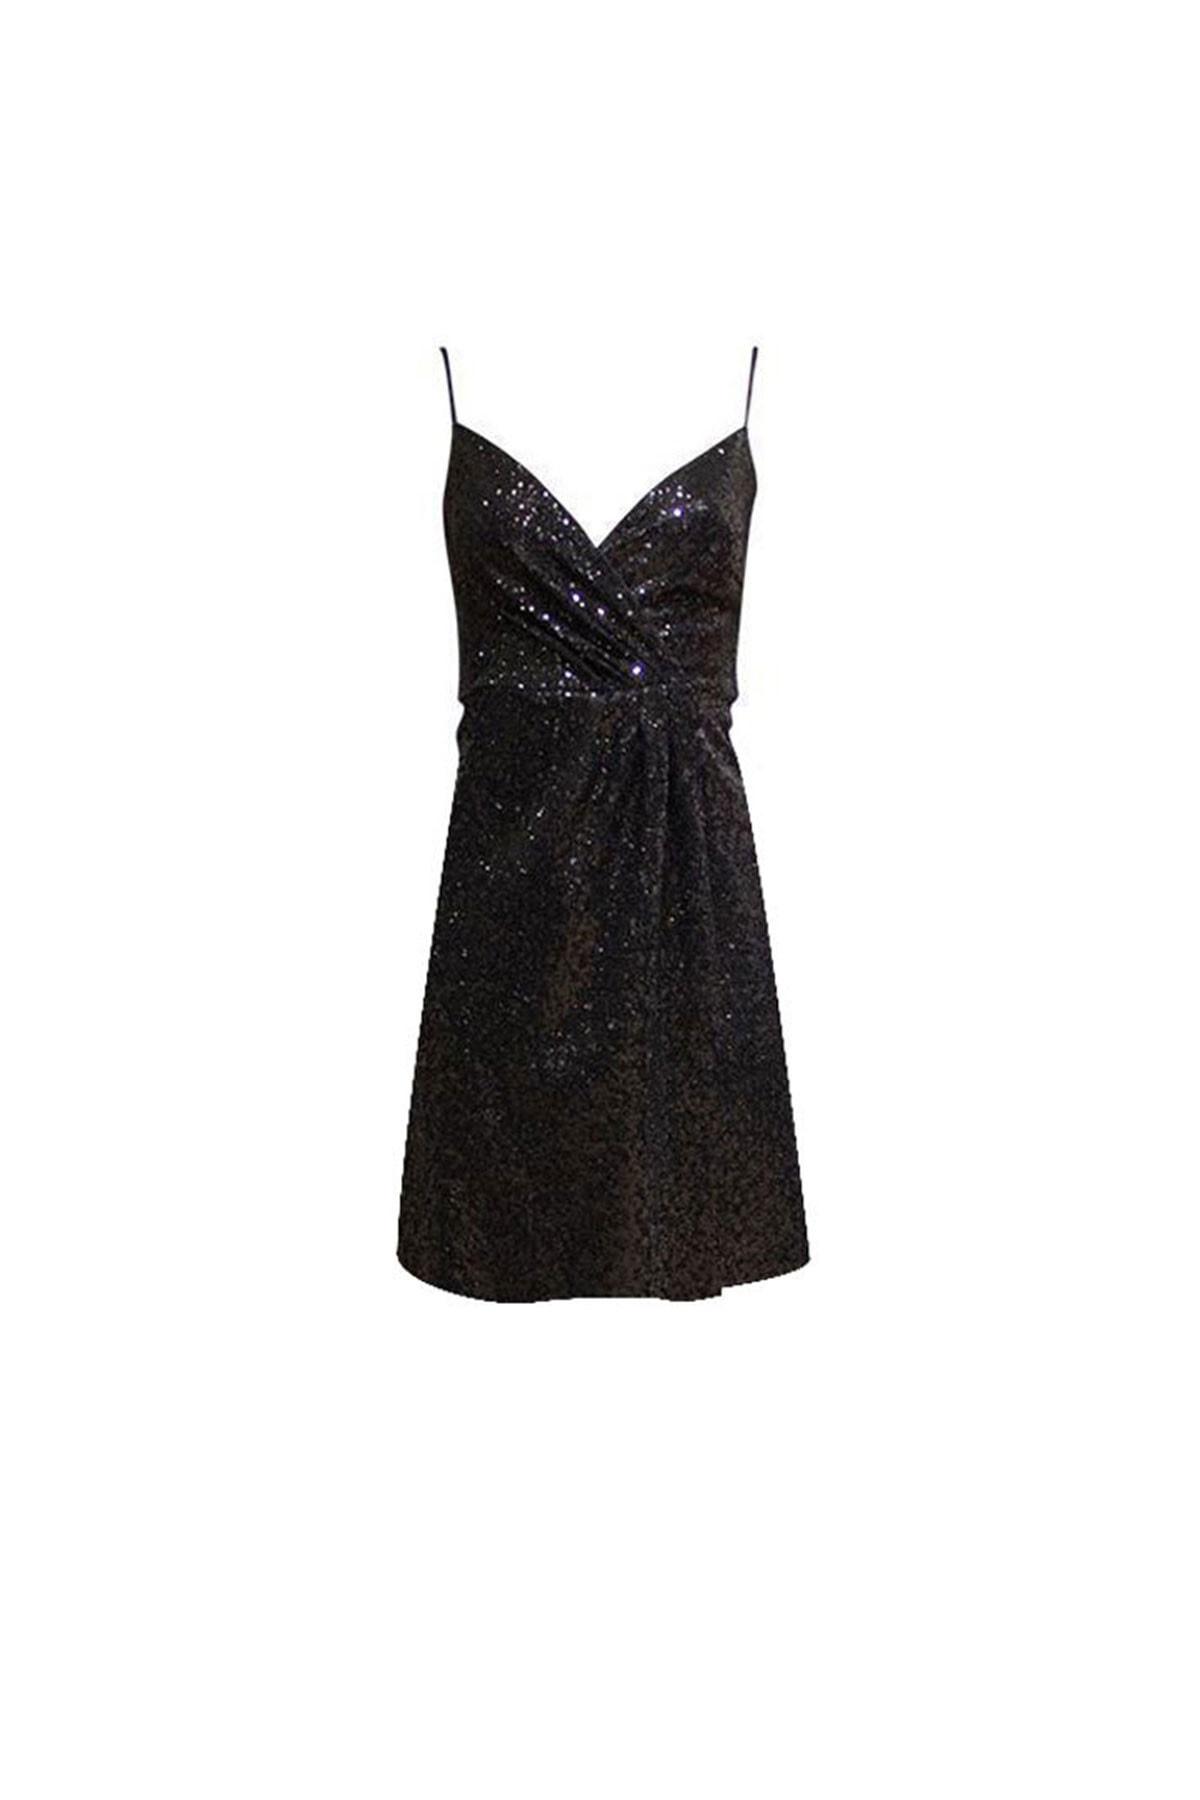 RİVUS Spagetti Askılı Payetli Mini Elbise 1462-1